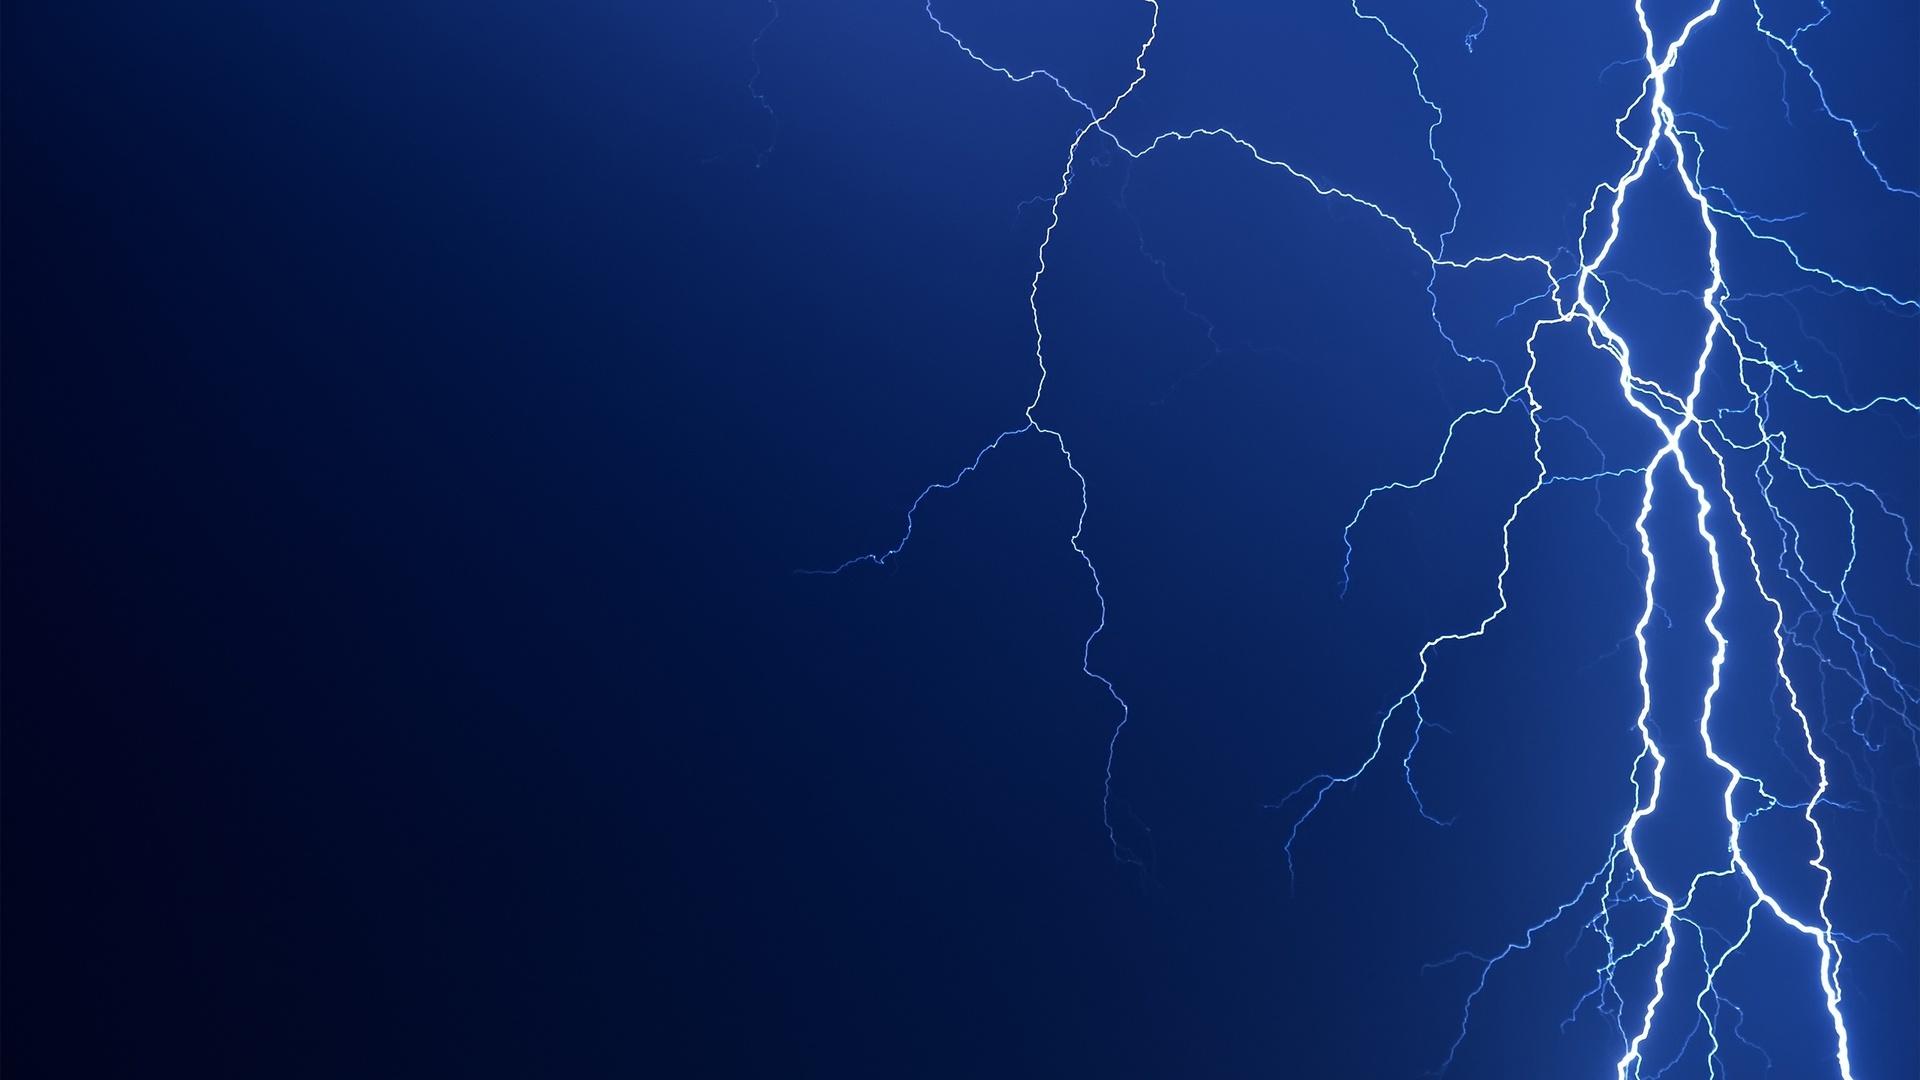 lightning live wallpaper free download